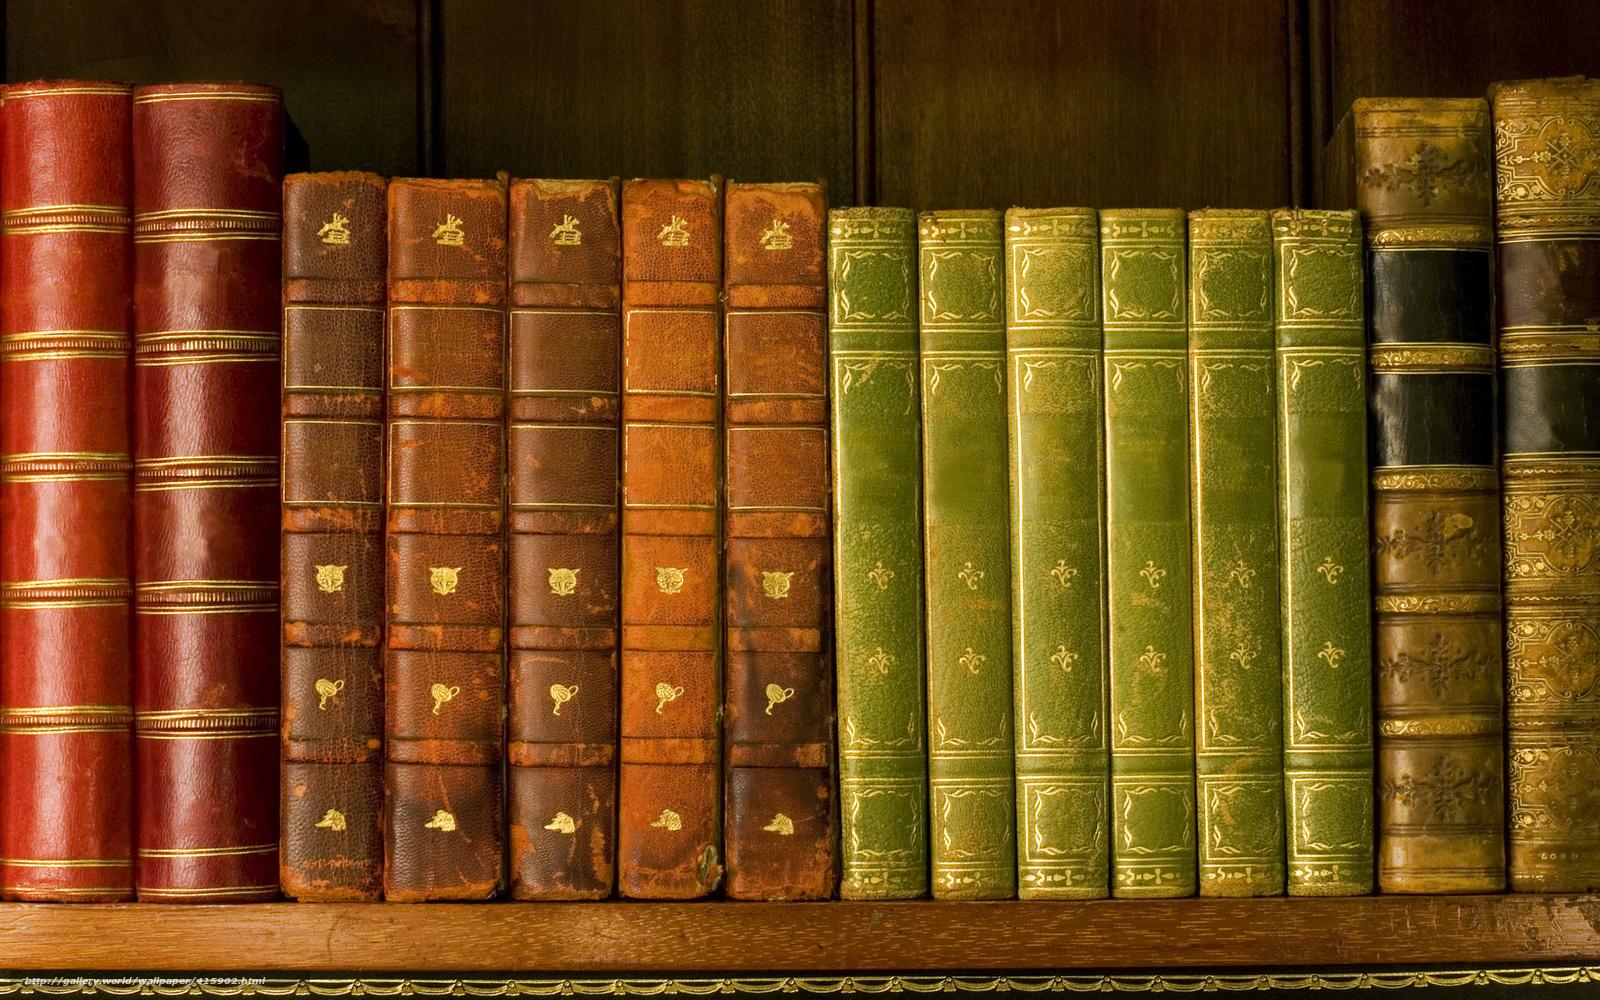 Download wallpaper Books roots shelf library desktop wallpaper 1600x1000